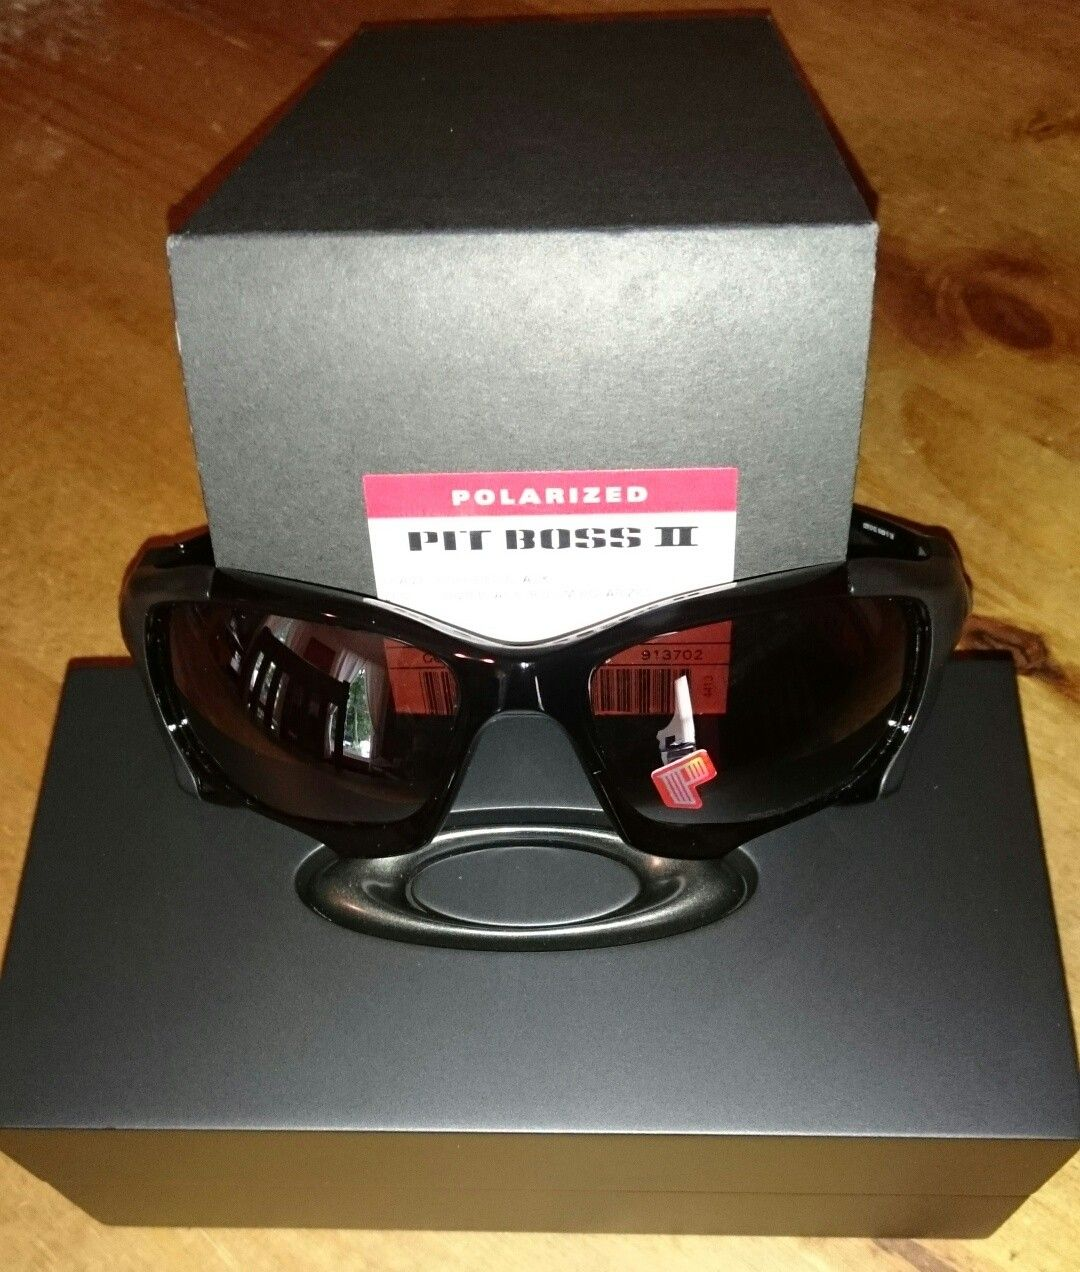 BNIB Pit Boss 2 - Polished Black with VR28 BIP - IMG_20150814_162822.JPG